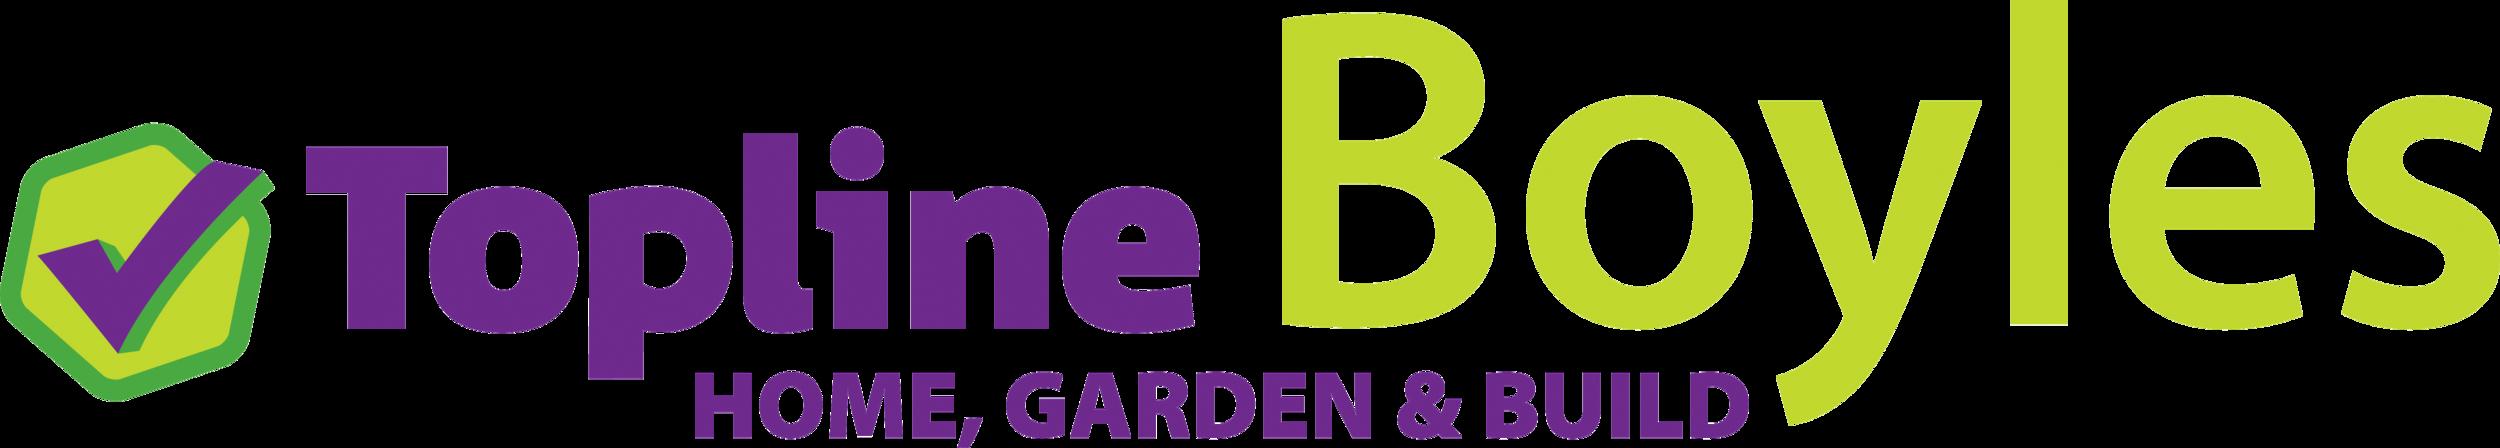 boyles logo.png